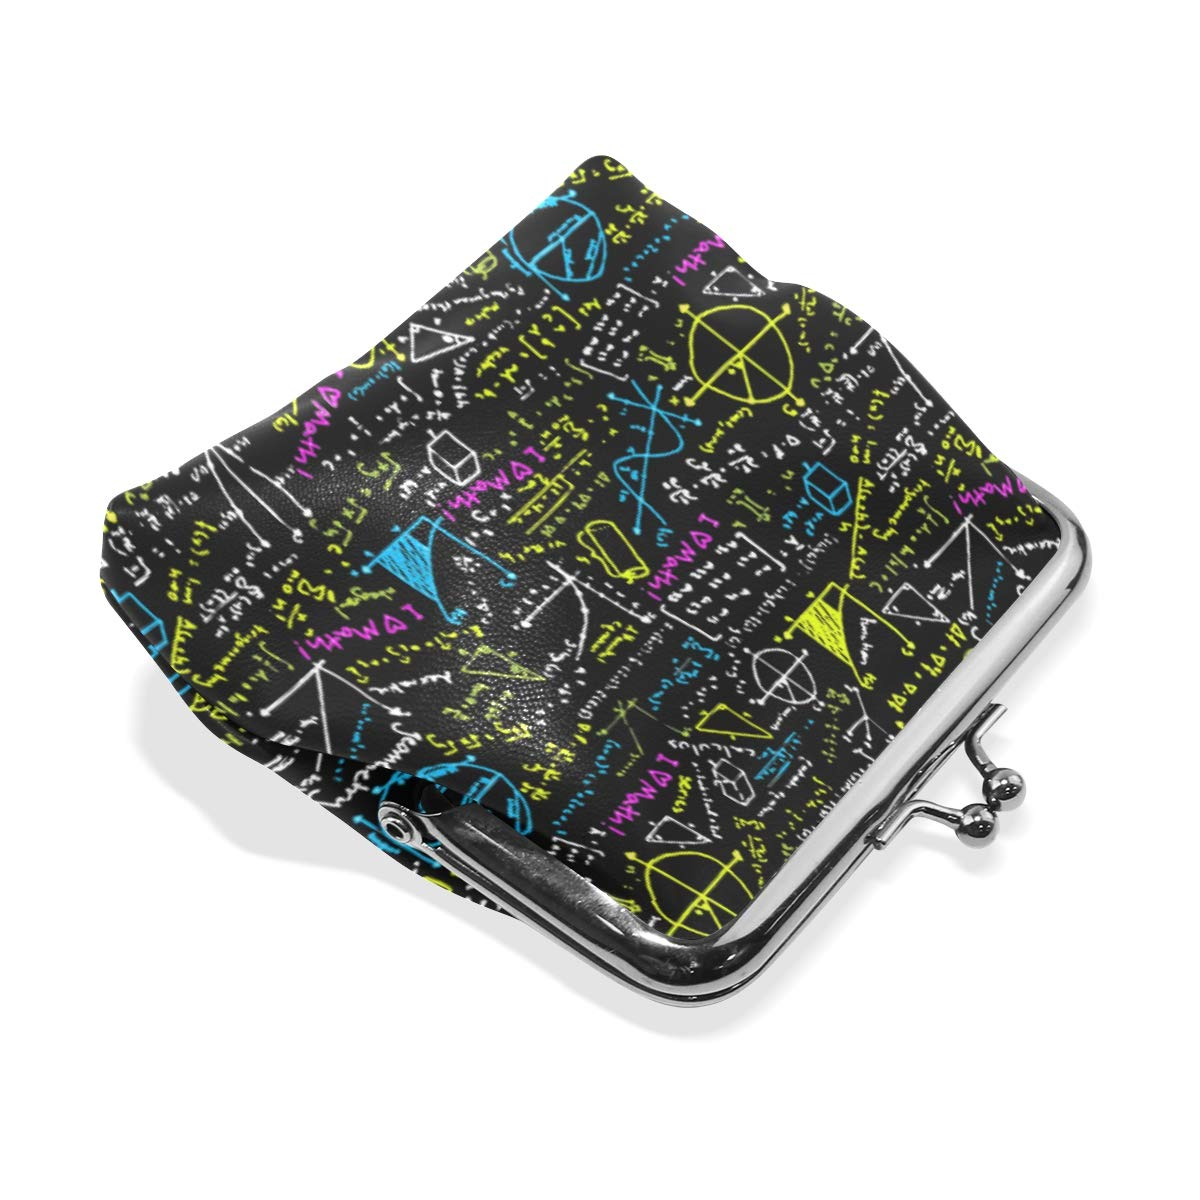 Black Math Physics Formula Coin Purse Buckle Vintage PU Pouch Kiss-lock Wallet for Women Girl